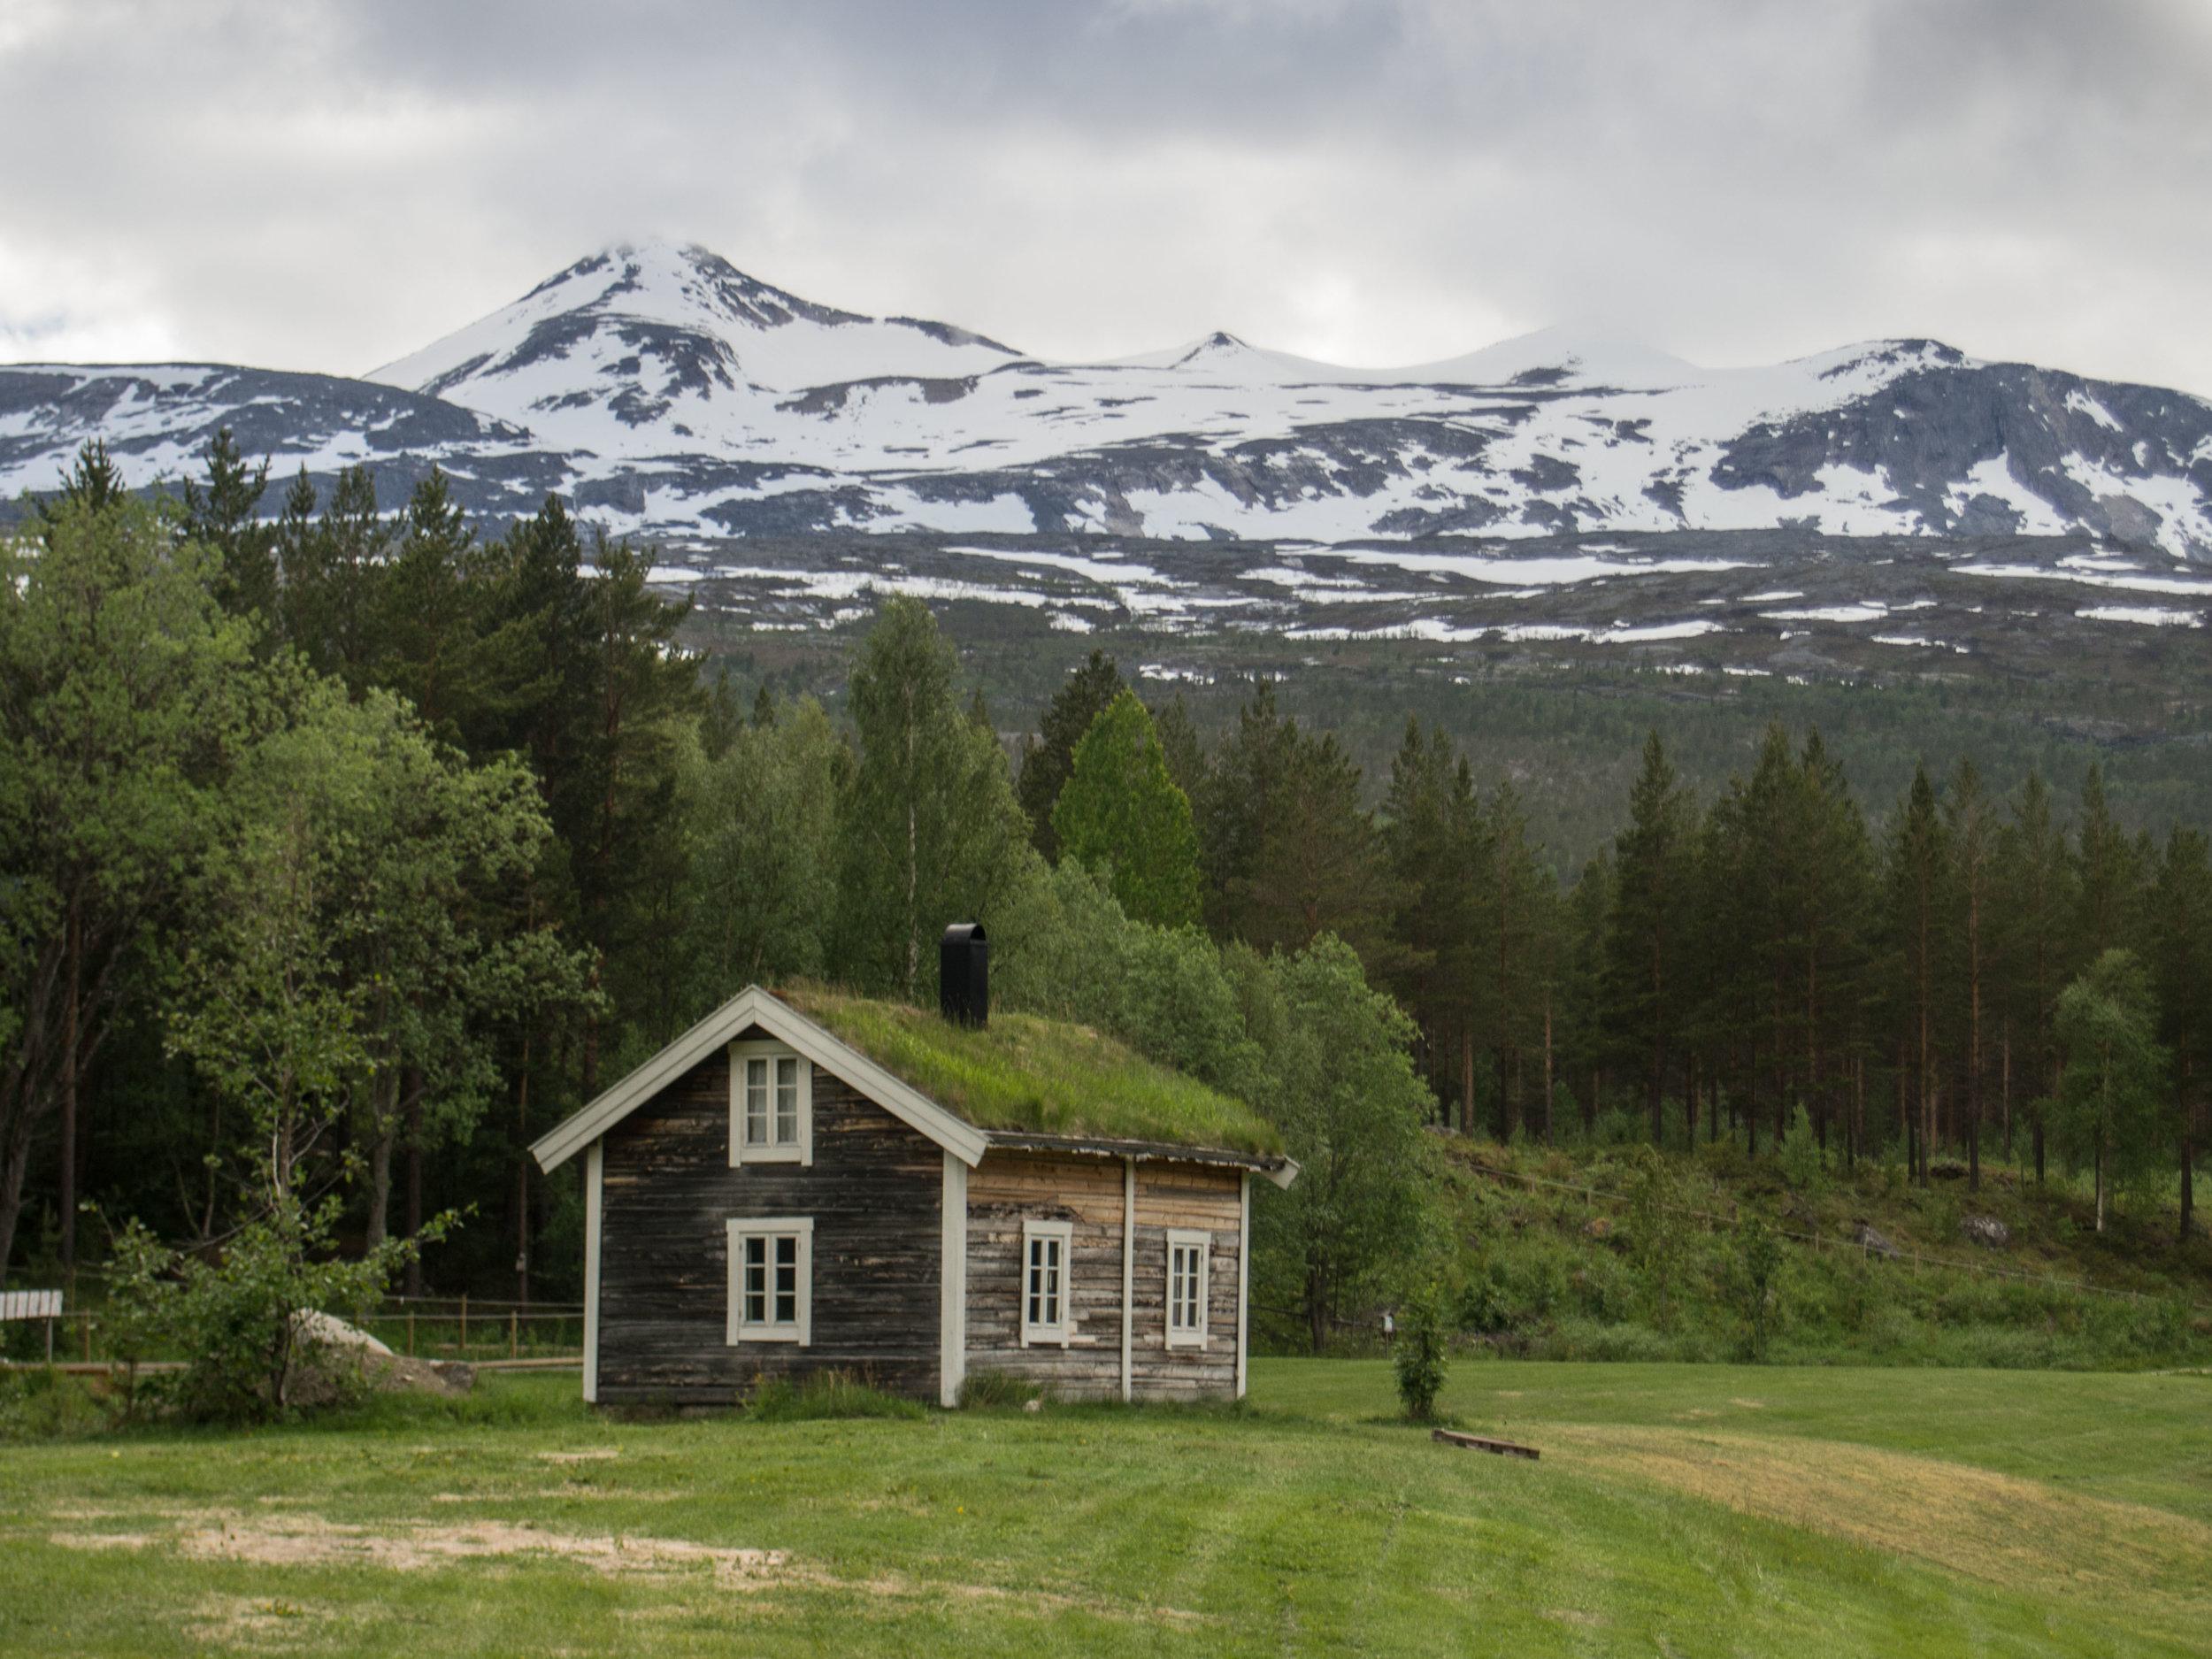 Stuga at Fulufjället National Park Hike